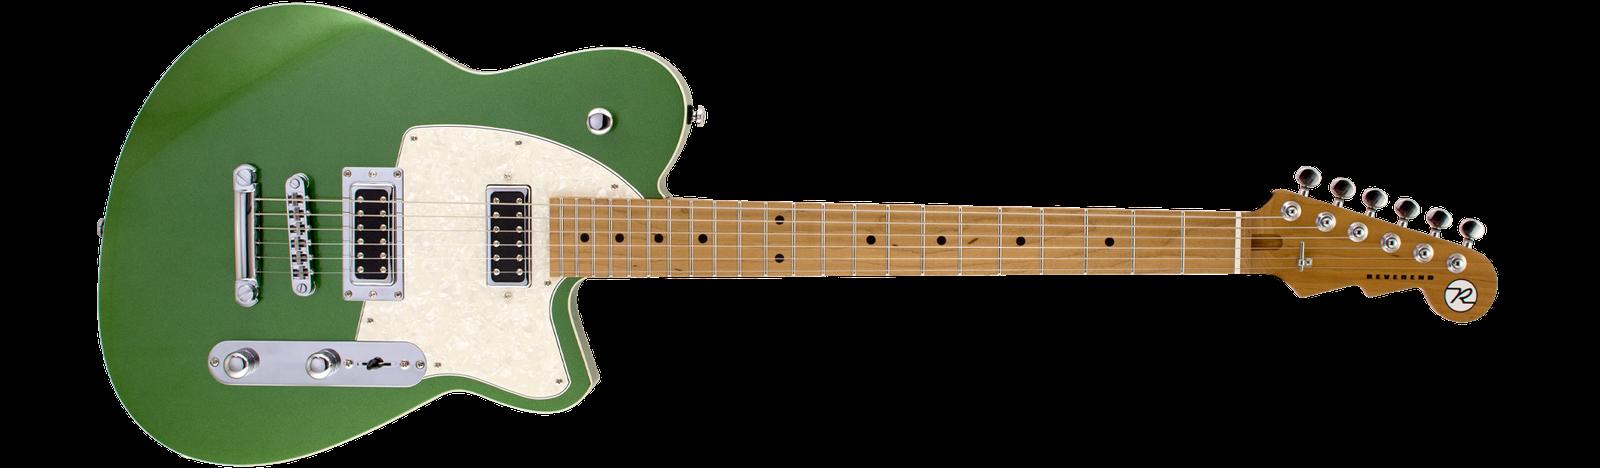 Reverend Guitars Flatroc Emerald